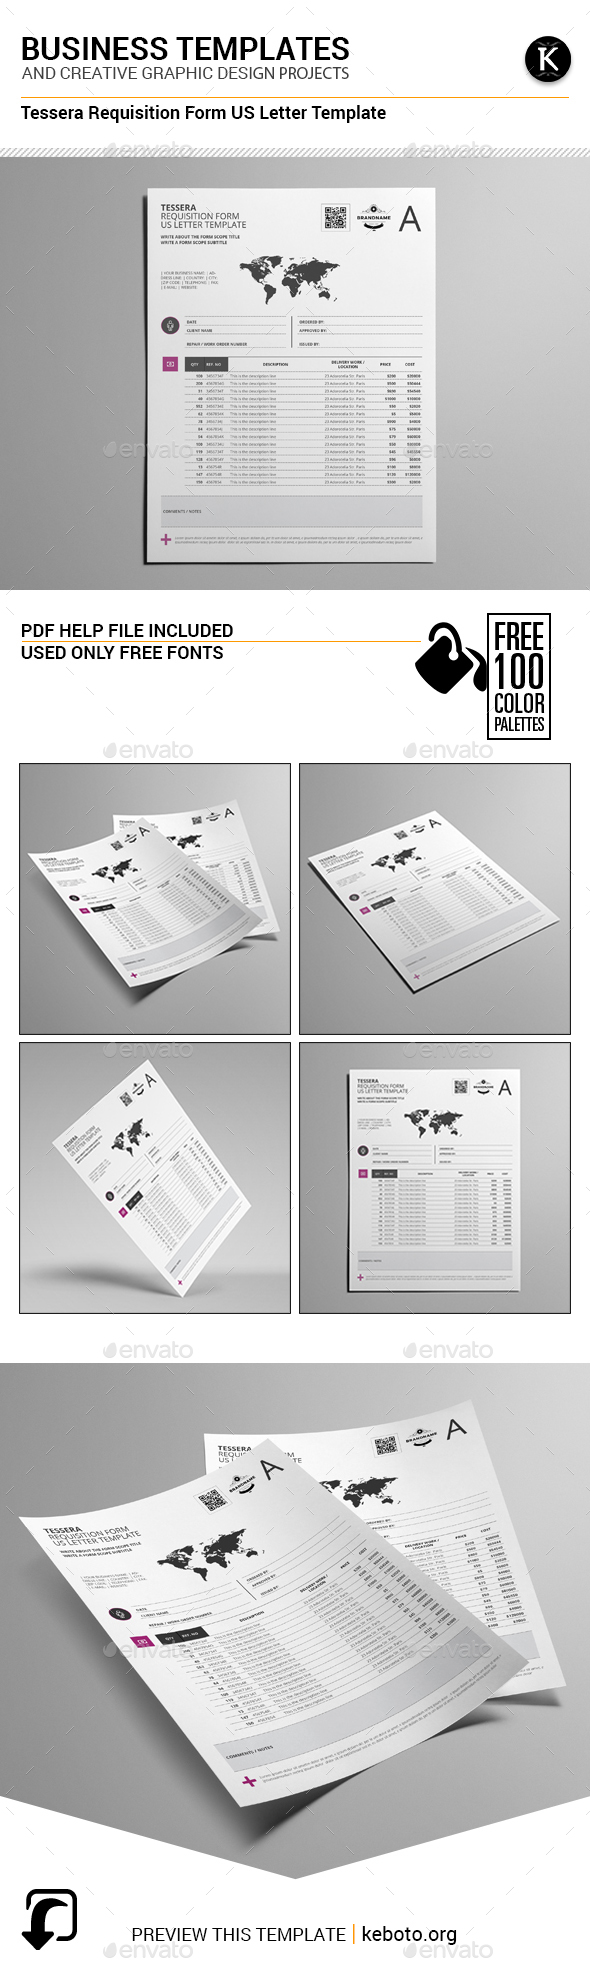 Tessera Requisition Form US Letter Template - Miscellaneous Print Templates